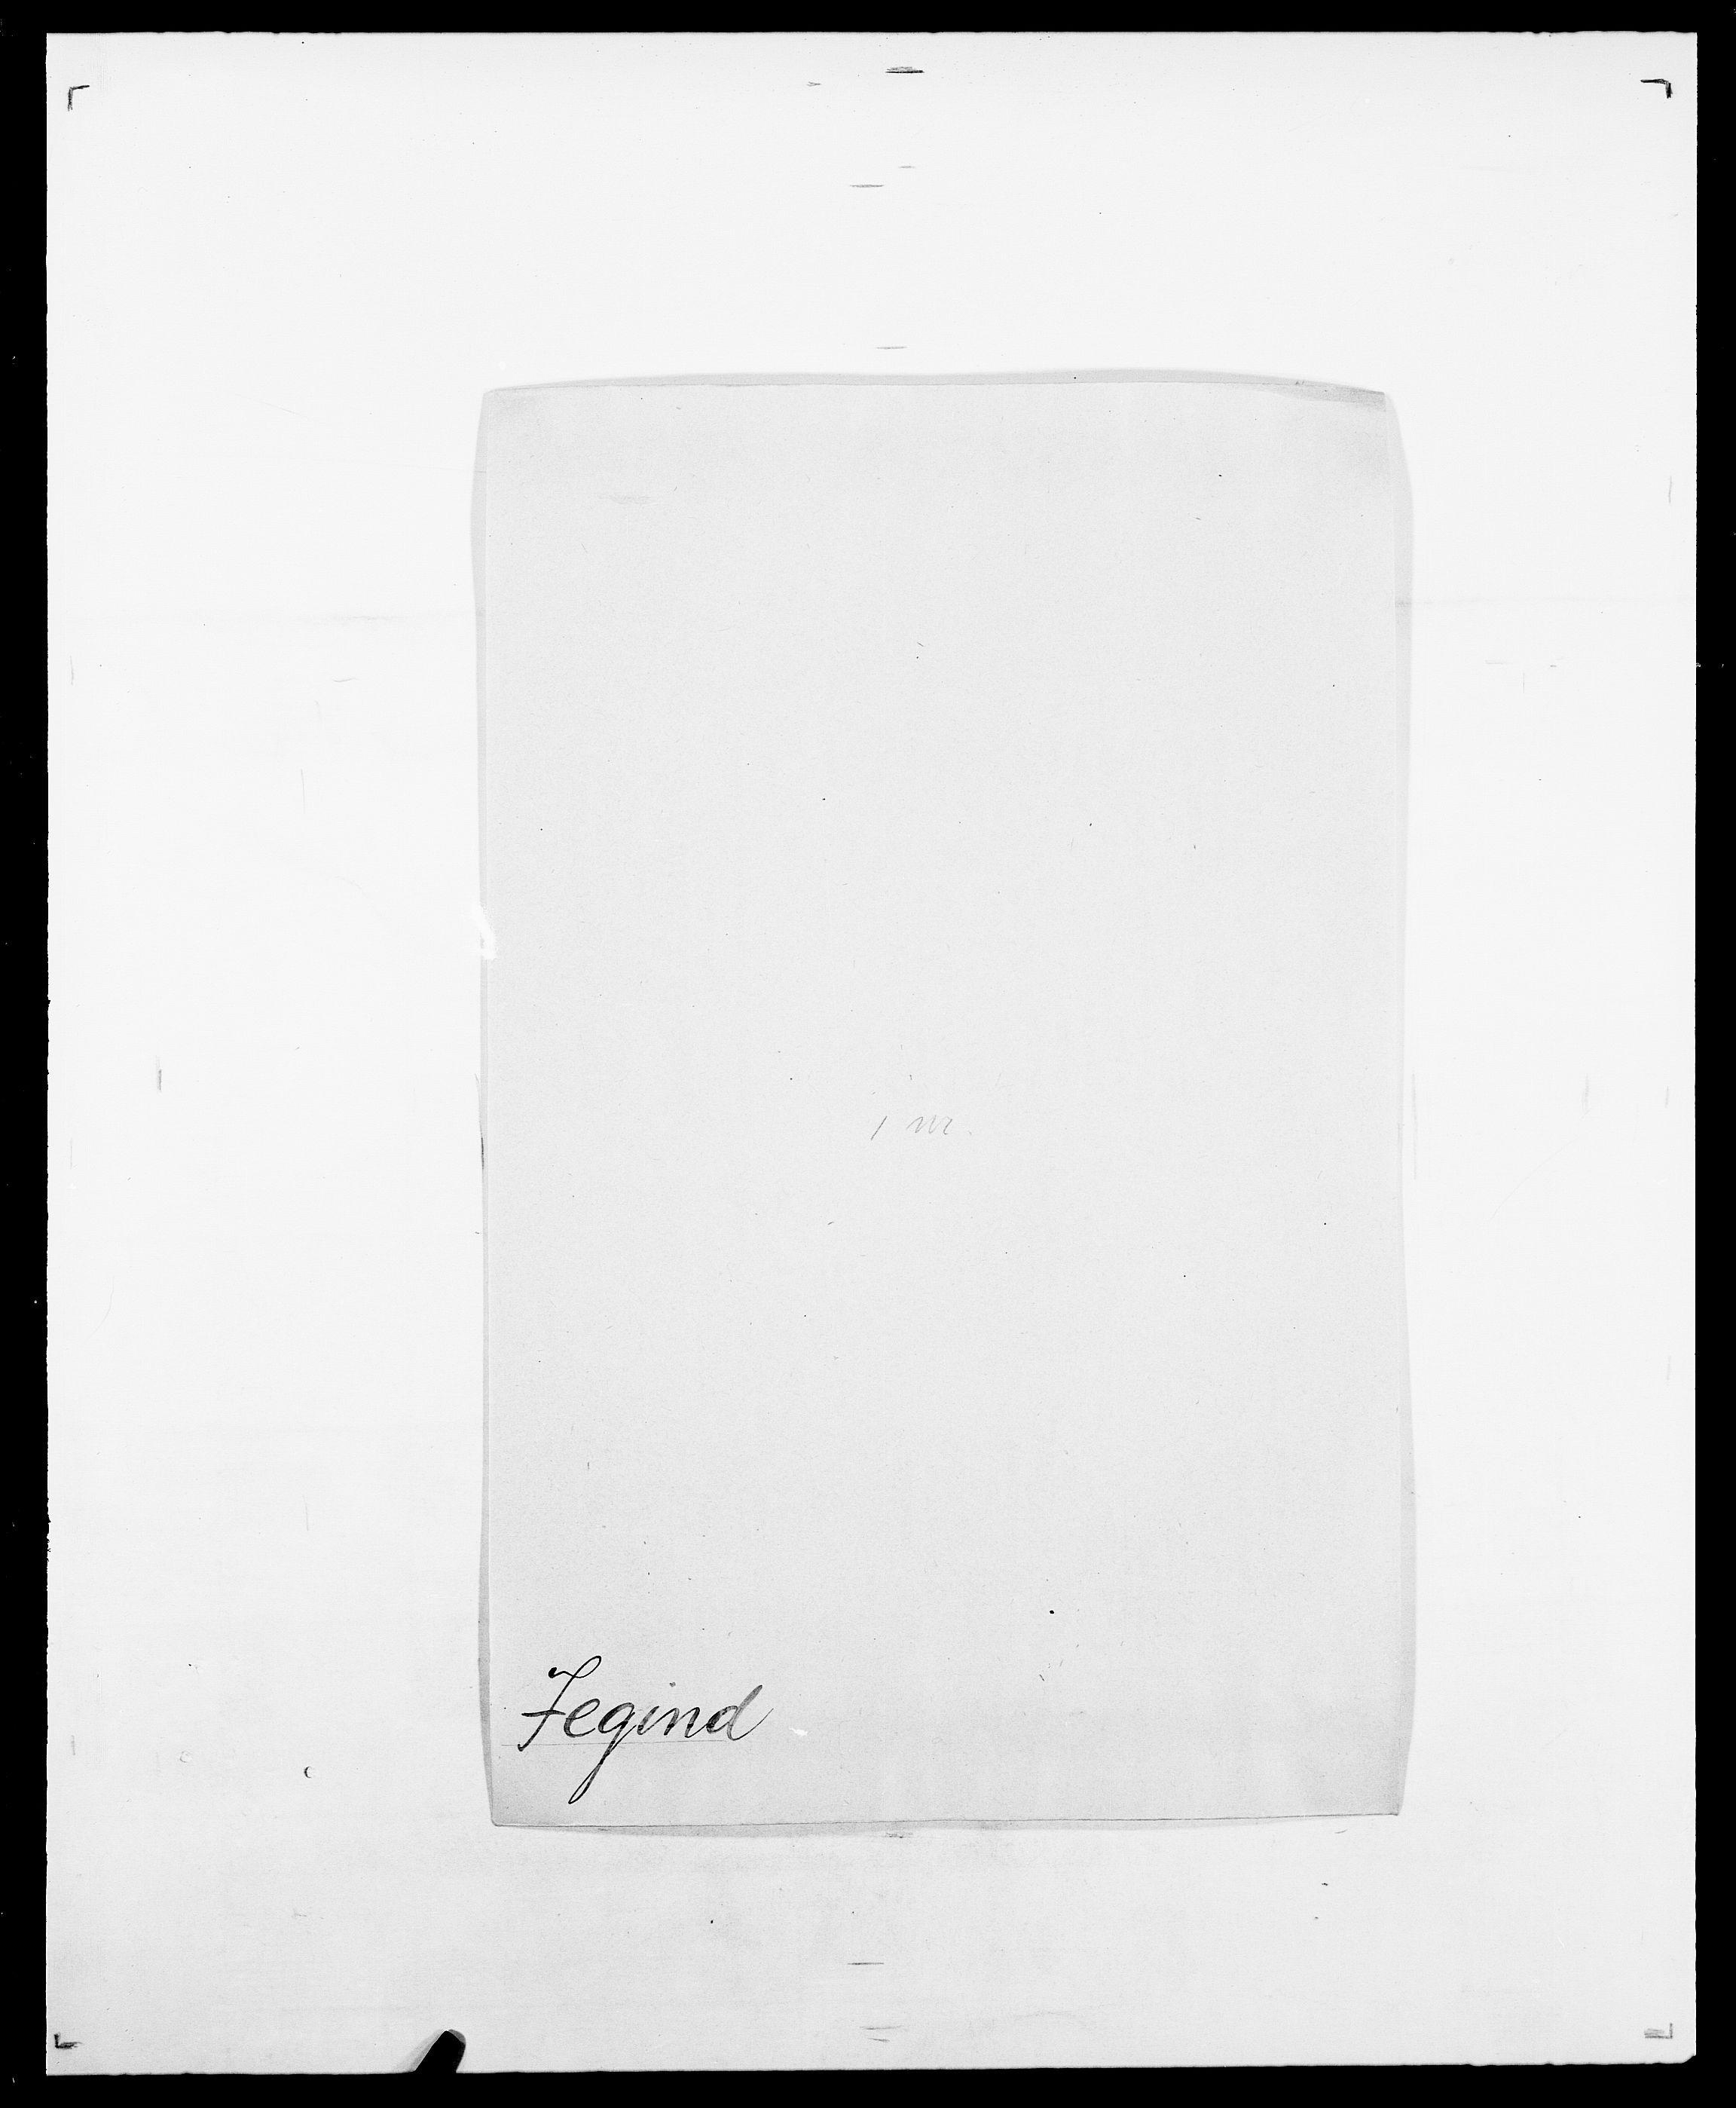 SAO, Delgobe, Charles Antoine - samling, D/Da/L0019: van der Hude - Joys, s. 623